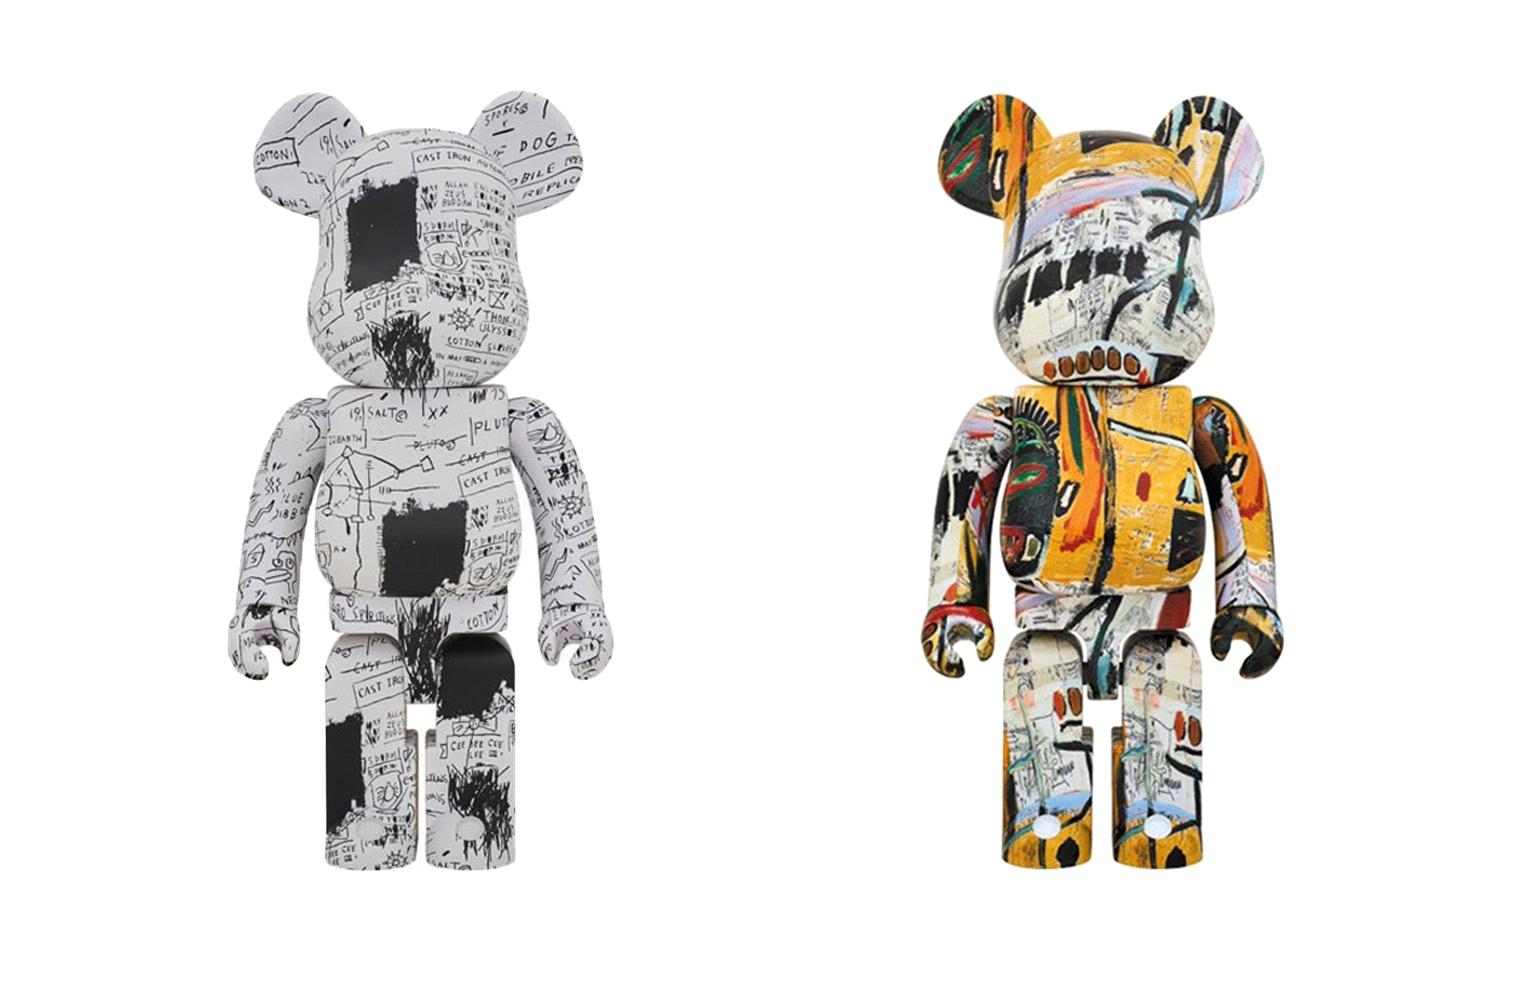 MediCom Toy x Jean-Michel Basquiat BE@RBRICK – все коллаборации художника с модными брендами